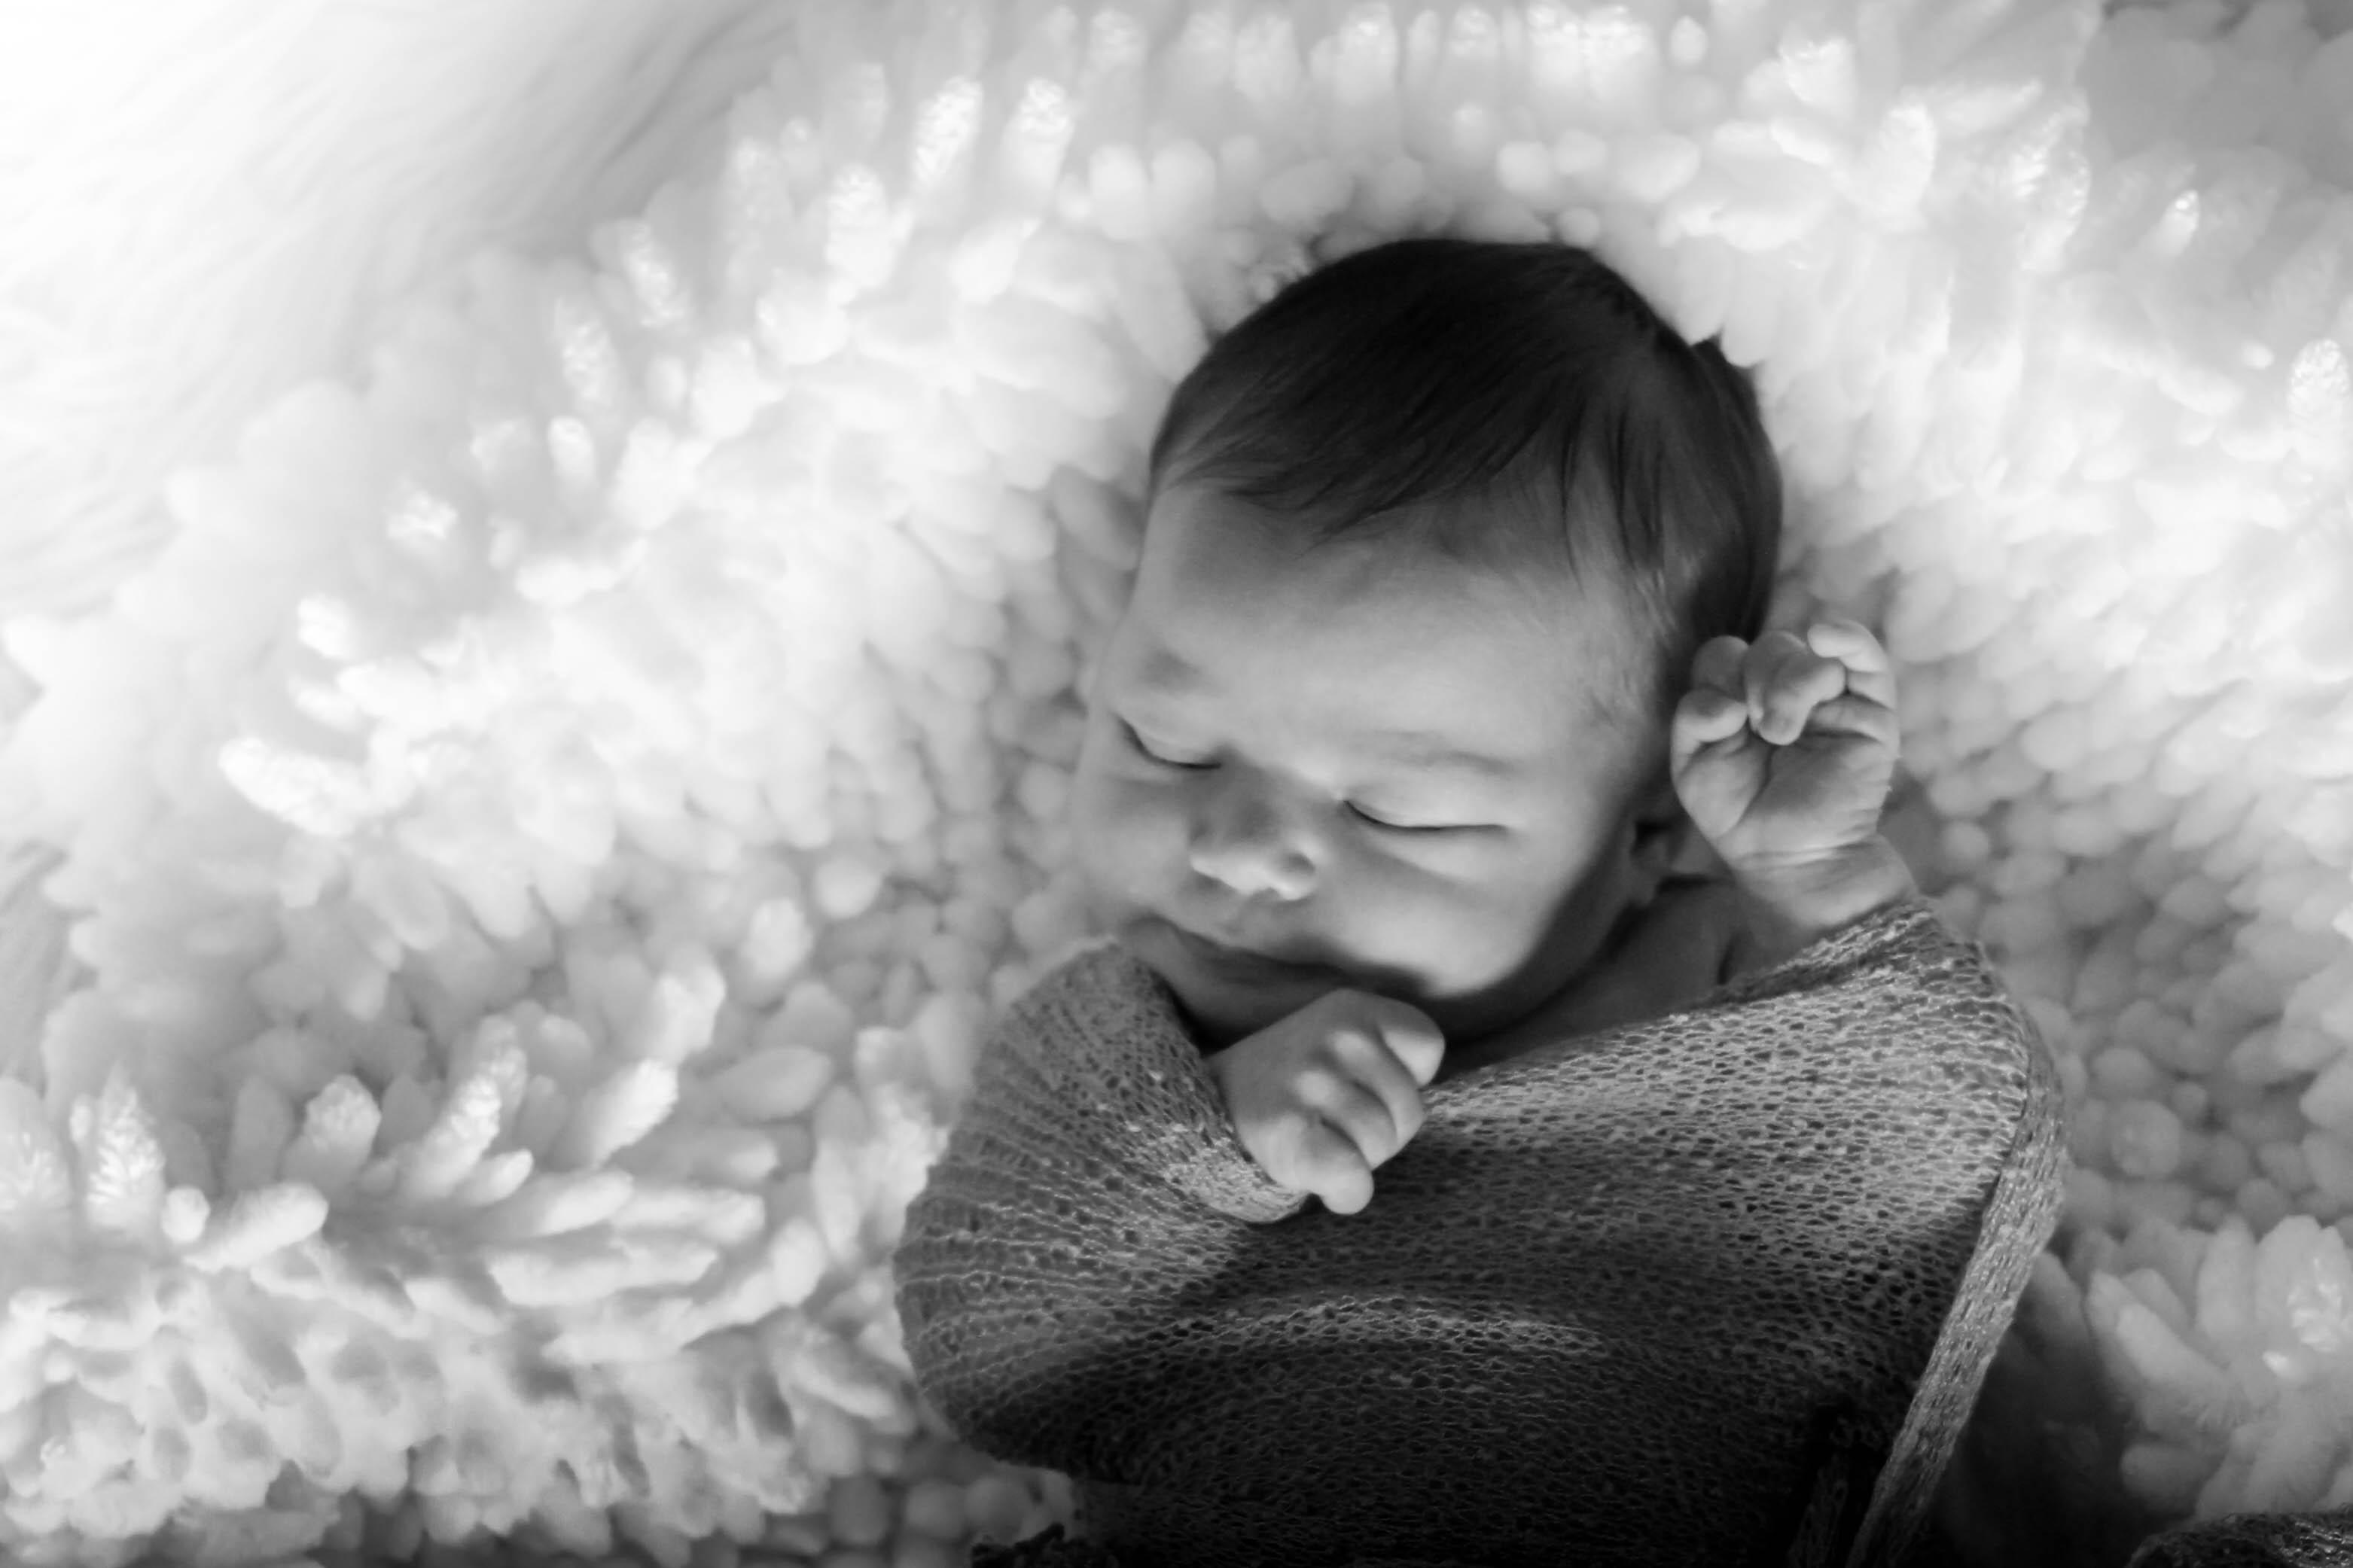 Myers Newborn Shoot by JeJe Design